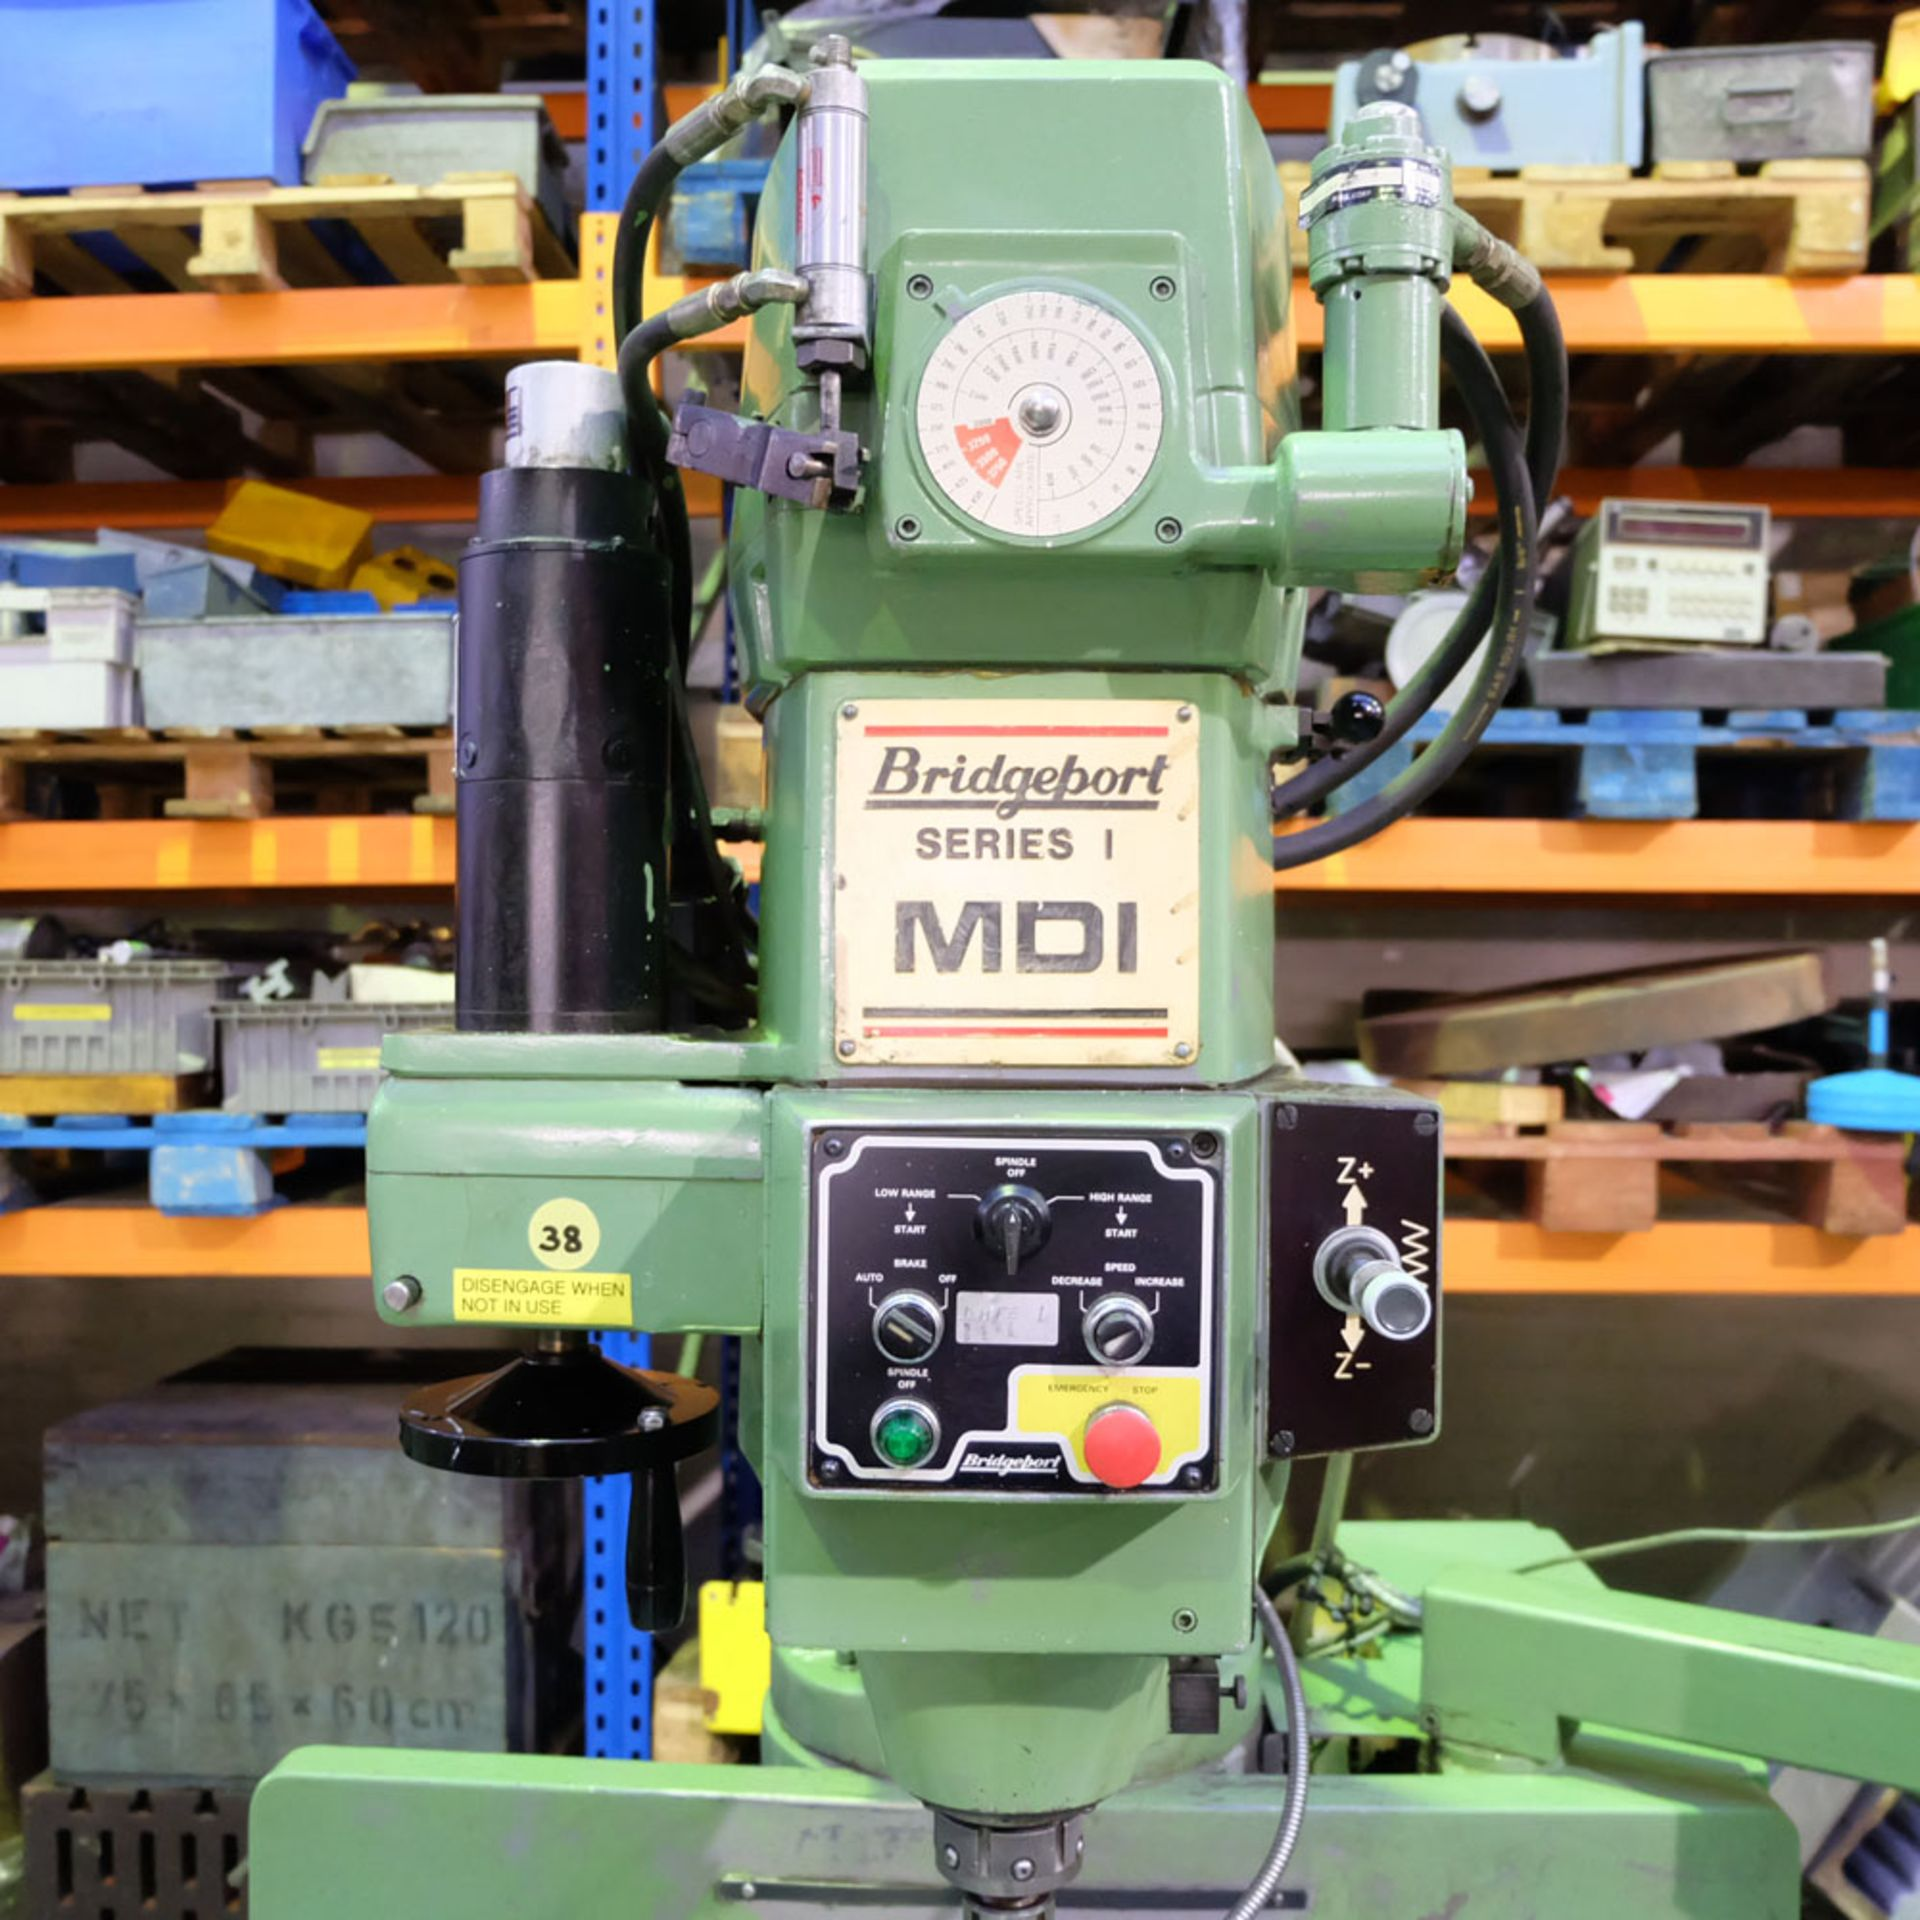 Bridgeport Series 1 MDI. CNC Mill with Heidenhain TNC131 3 Axis Control. - Image 4 of 14